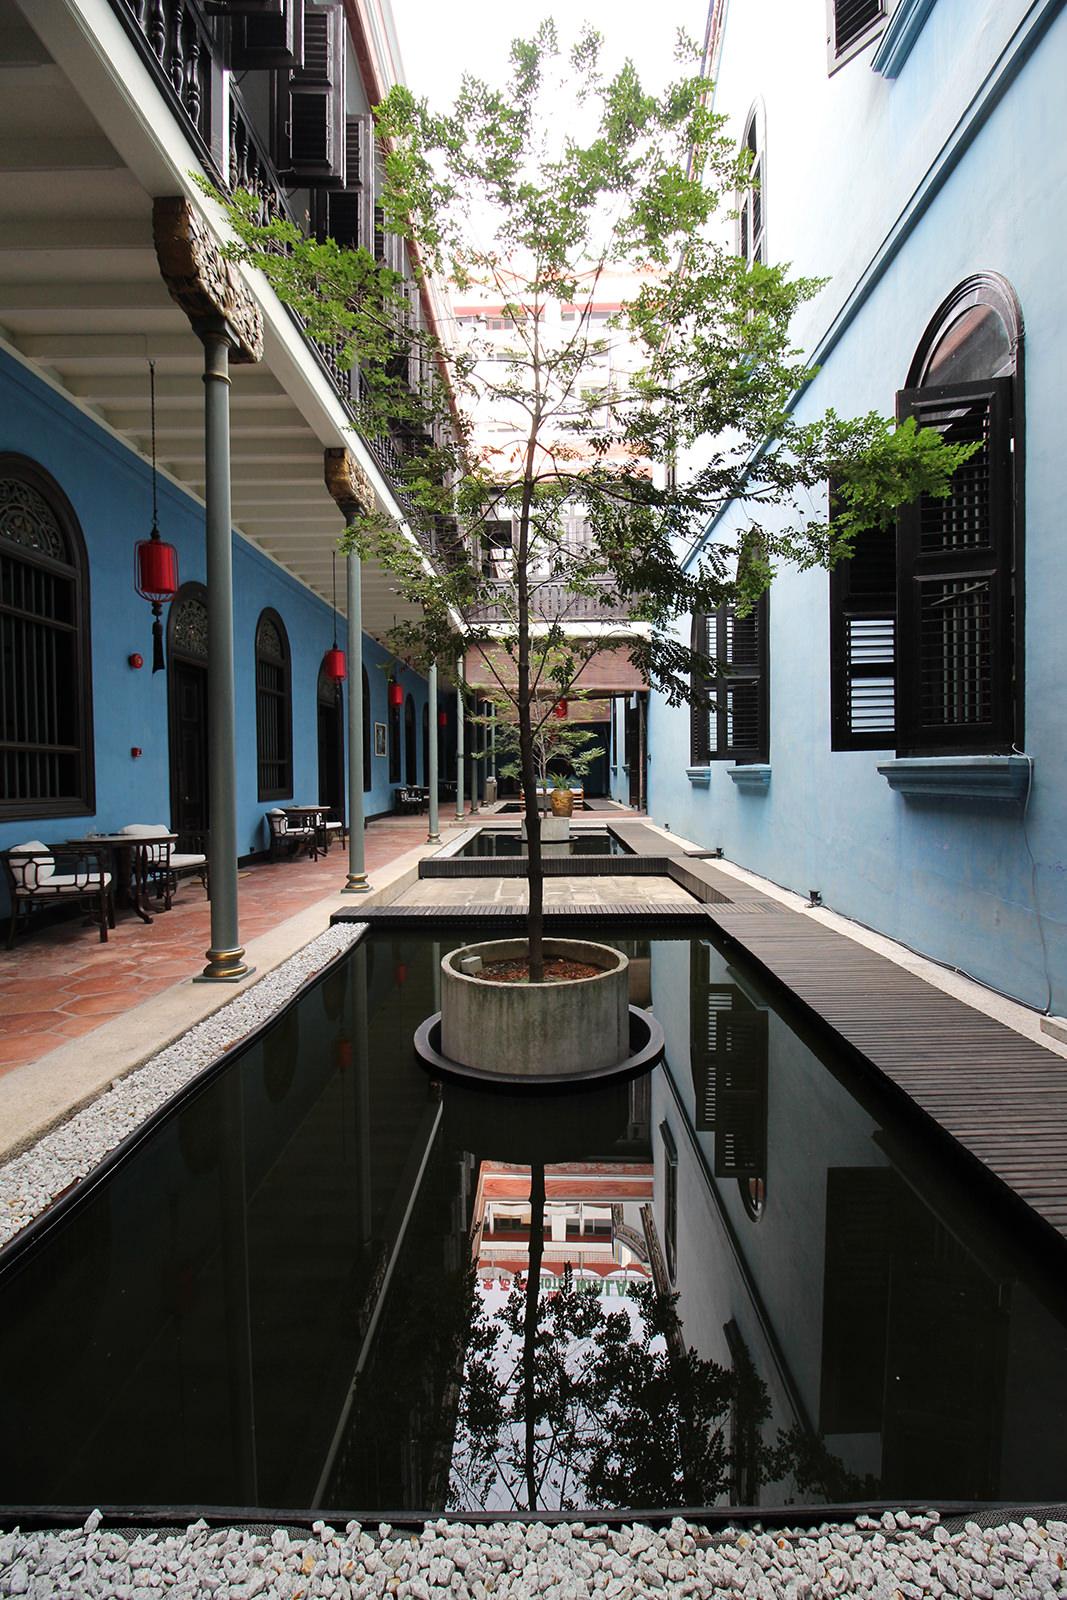 boutique-hotel-penang-island-blue-mansion-architecture-01-1 Architecture